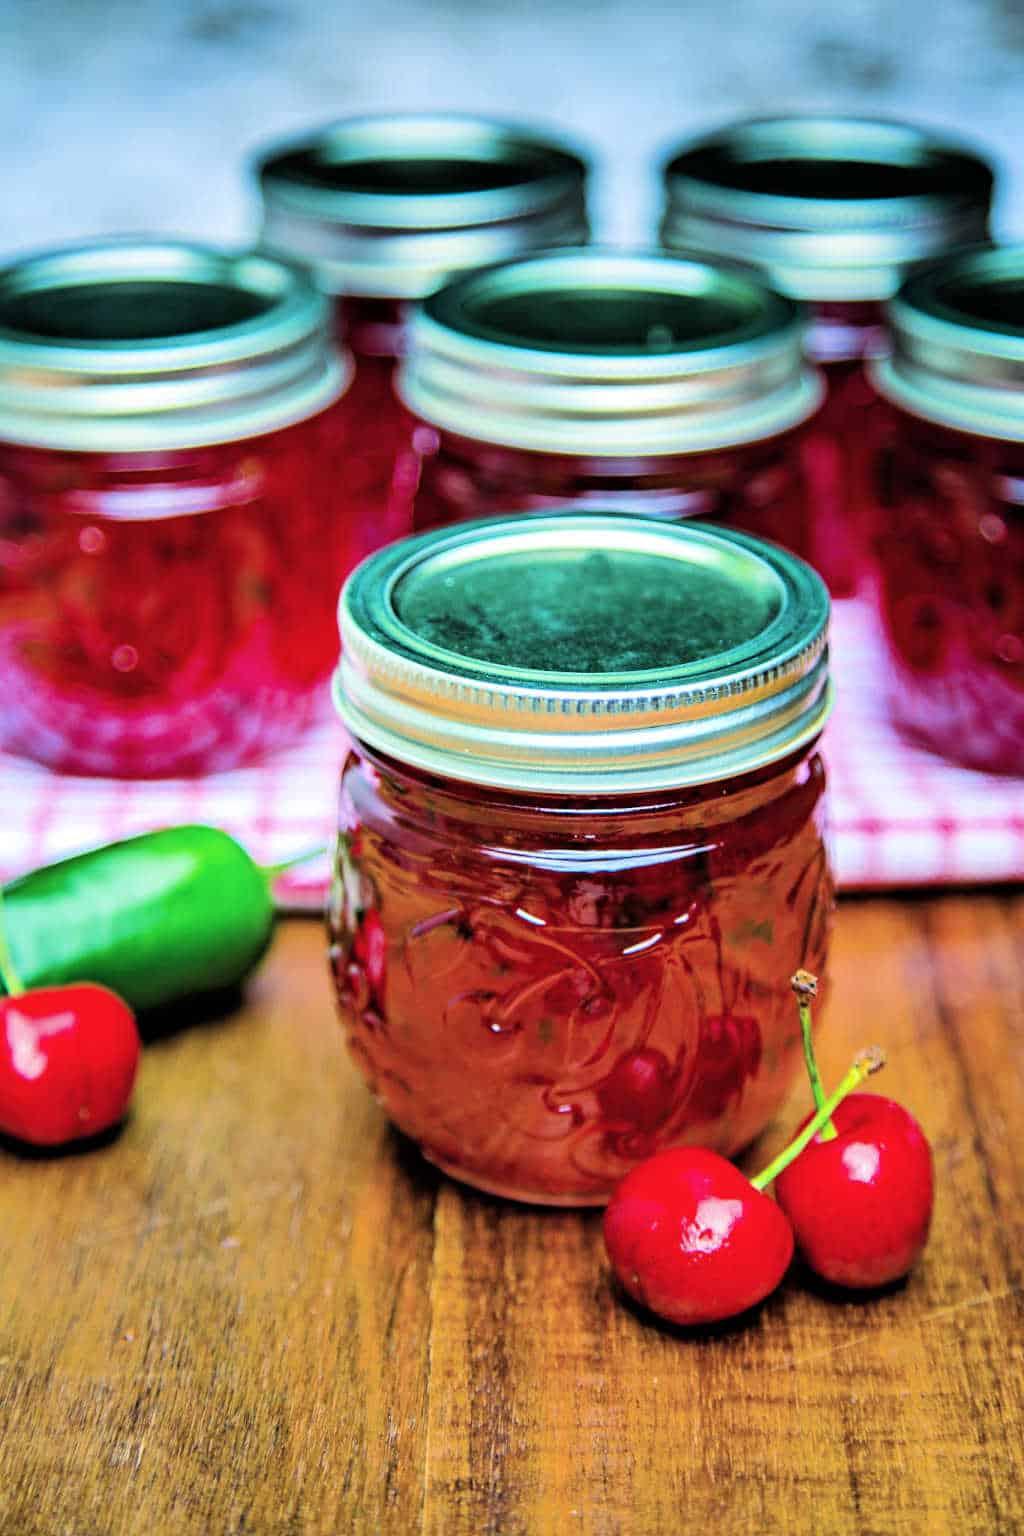 hot cherry pepper jelly in jars